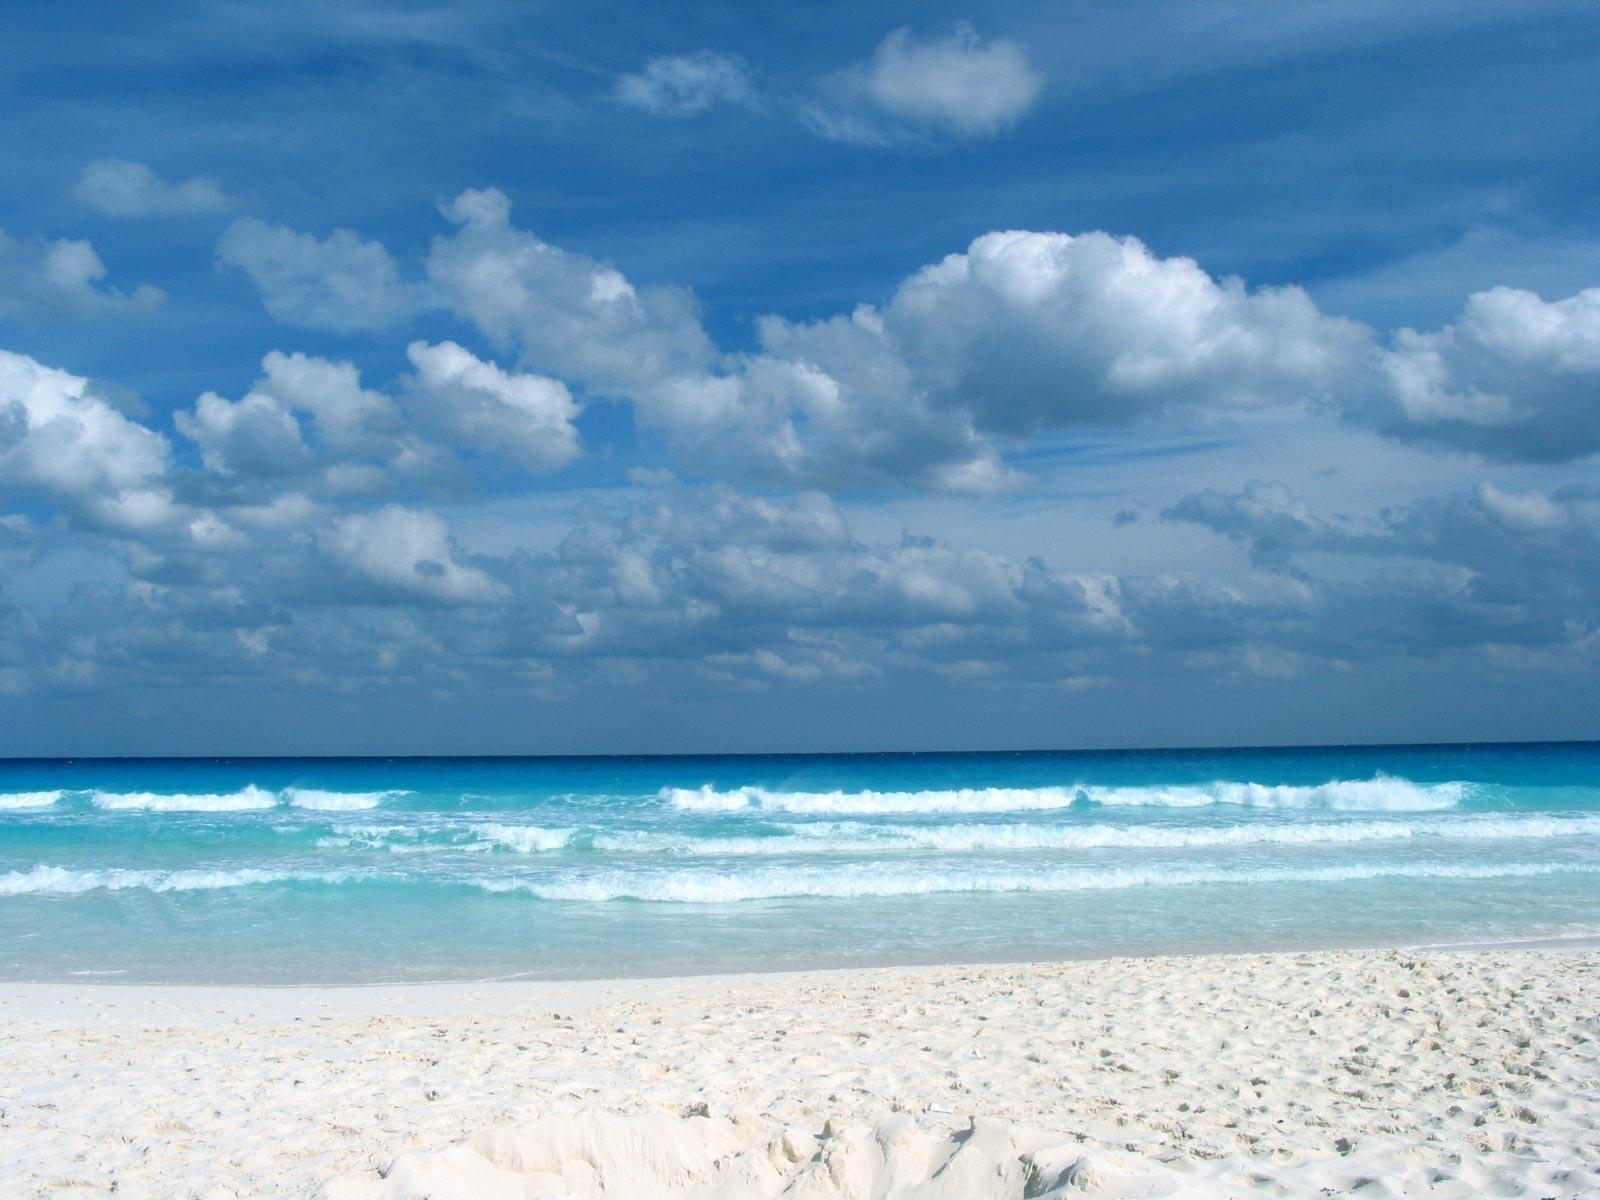 Beach Wallpaper Sea Pictures Desktop Backgrounds Beach Images 1600x1200